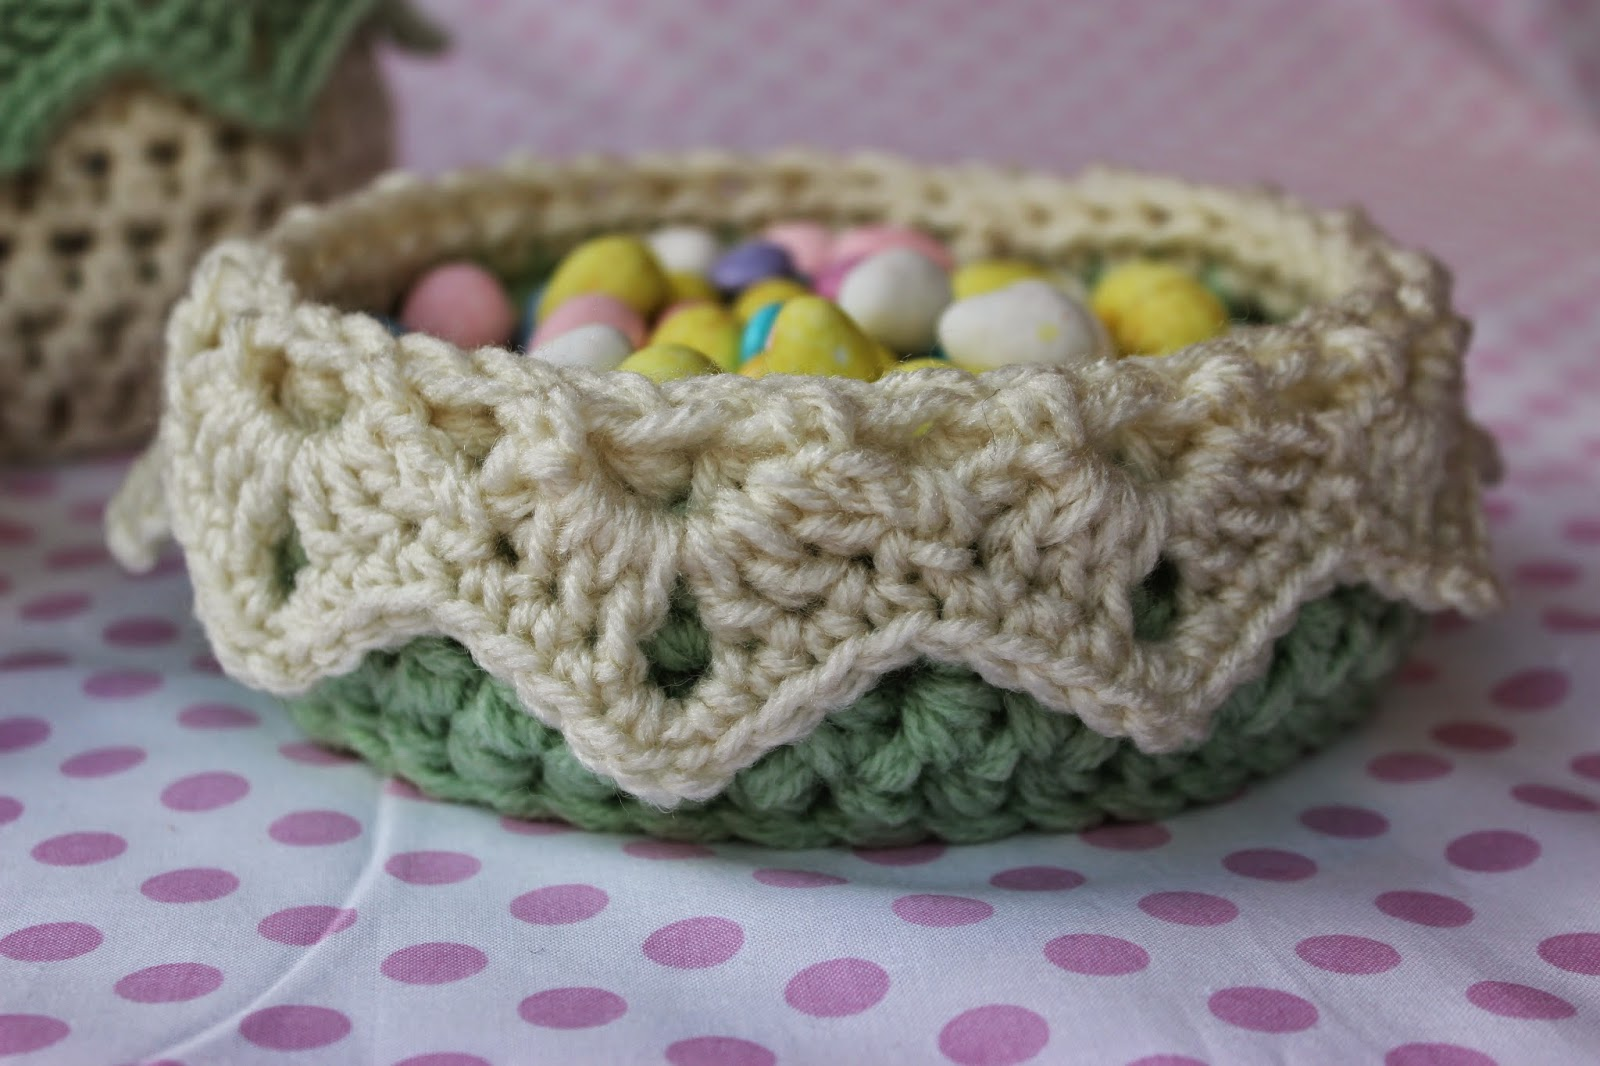 26 Crochet Basket Patterns for Beginners - Patterns Hub